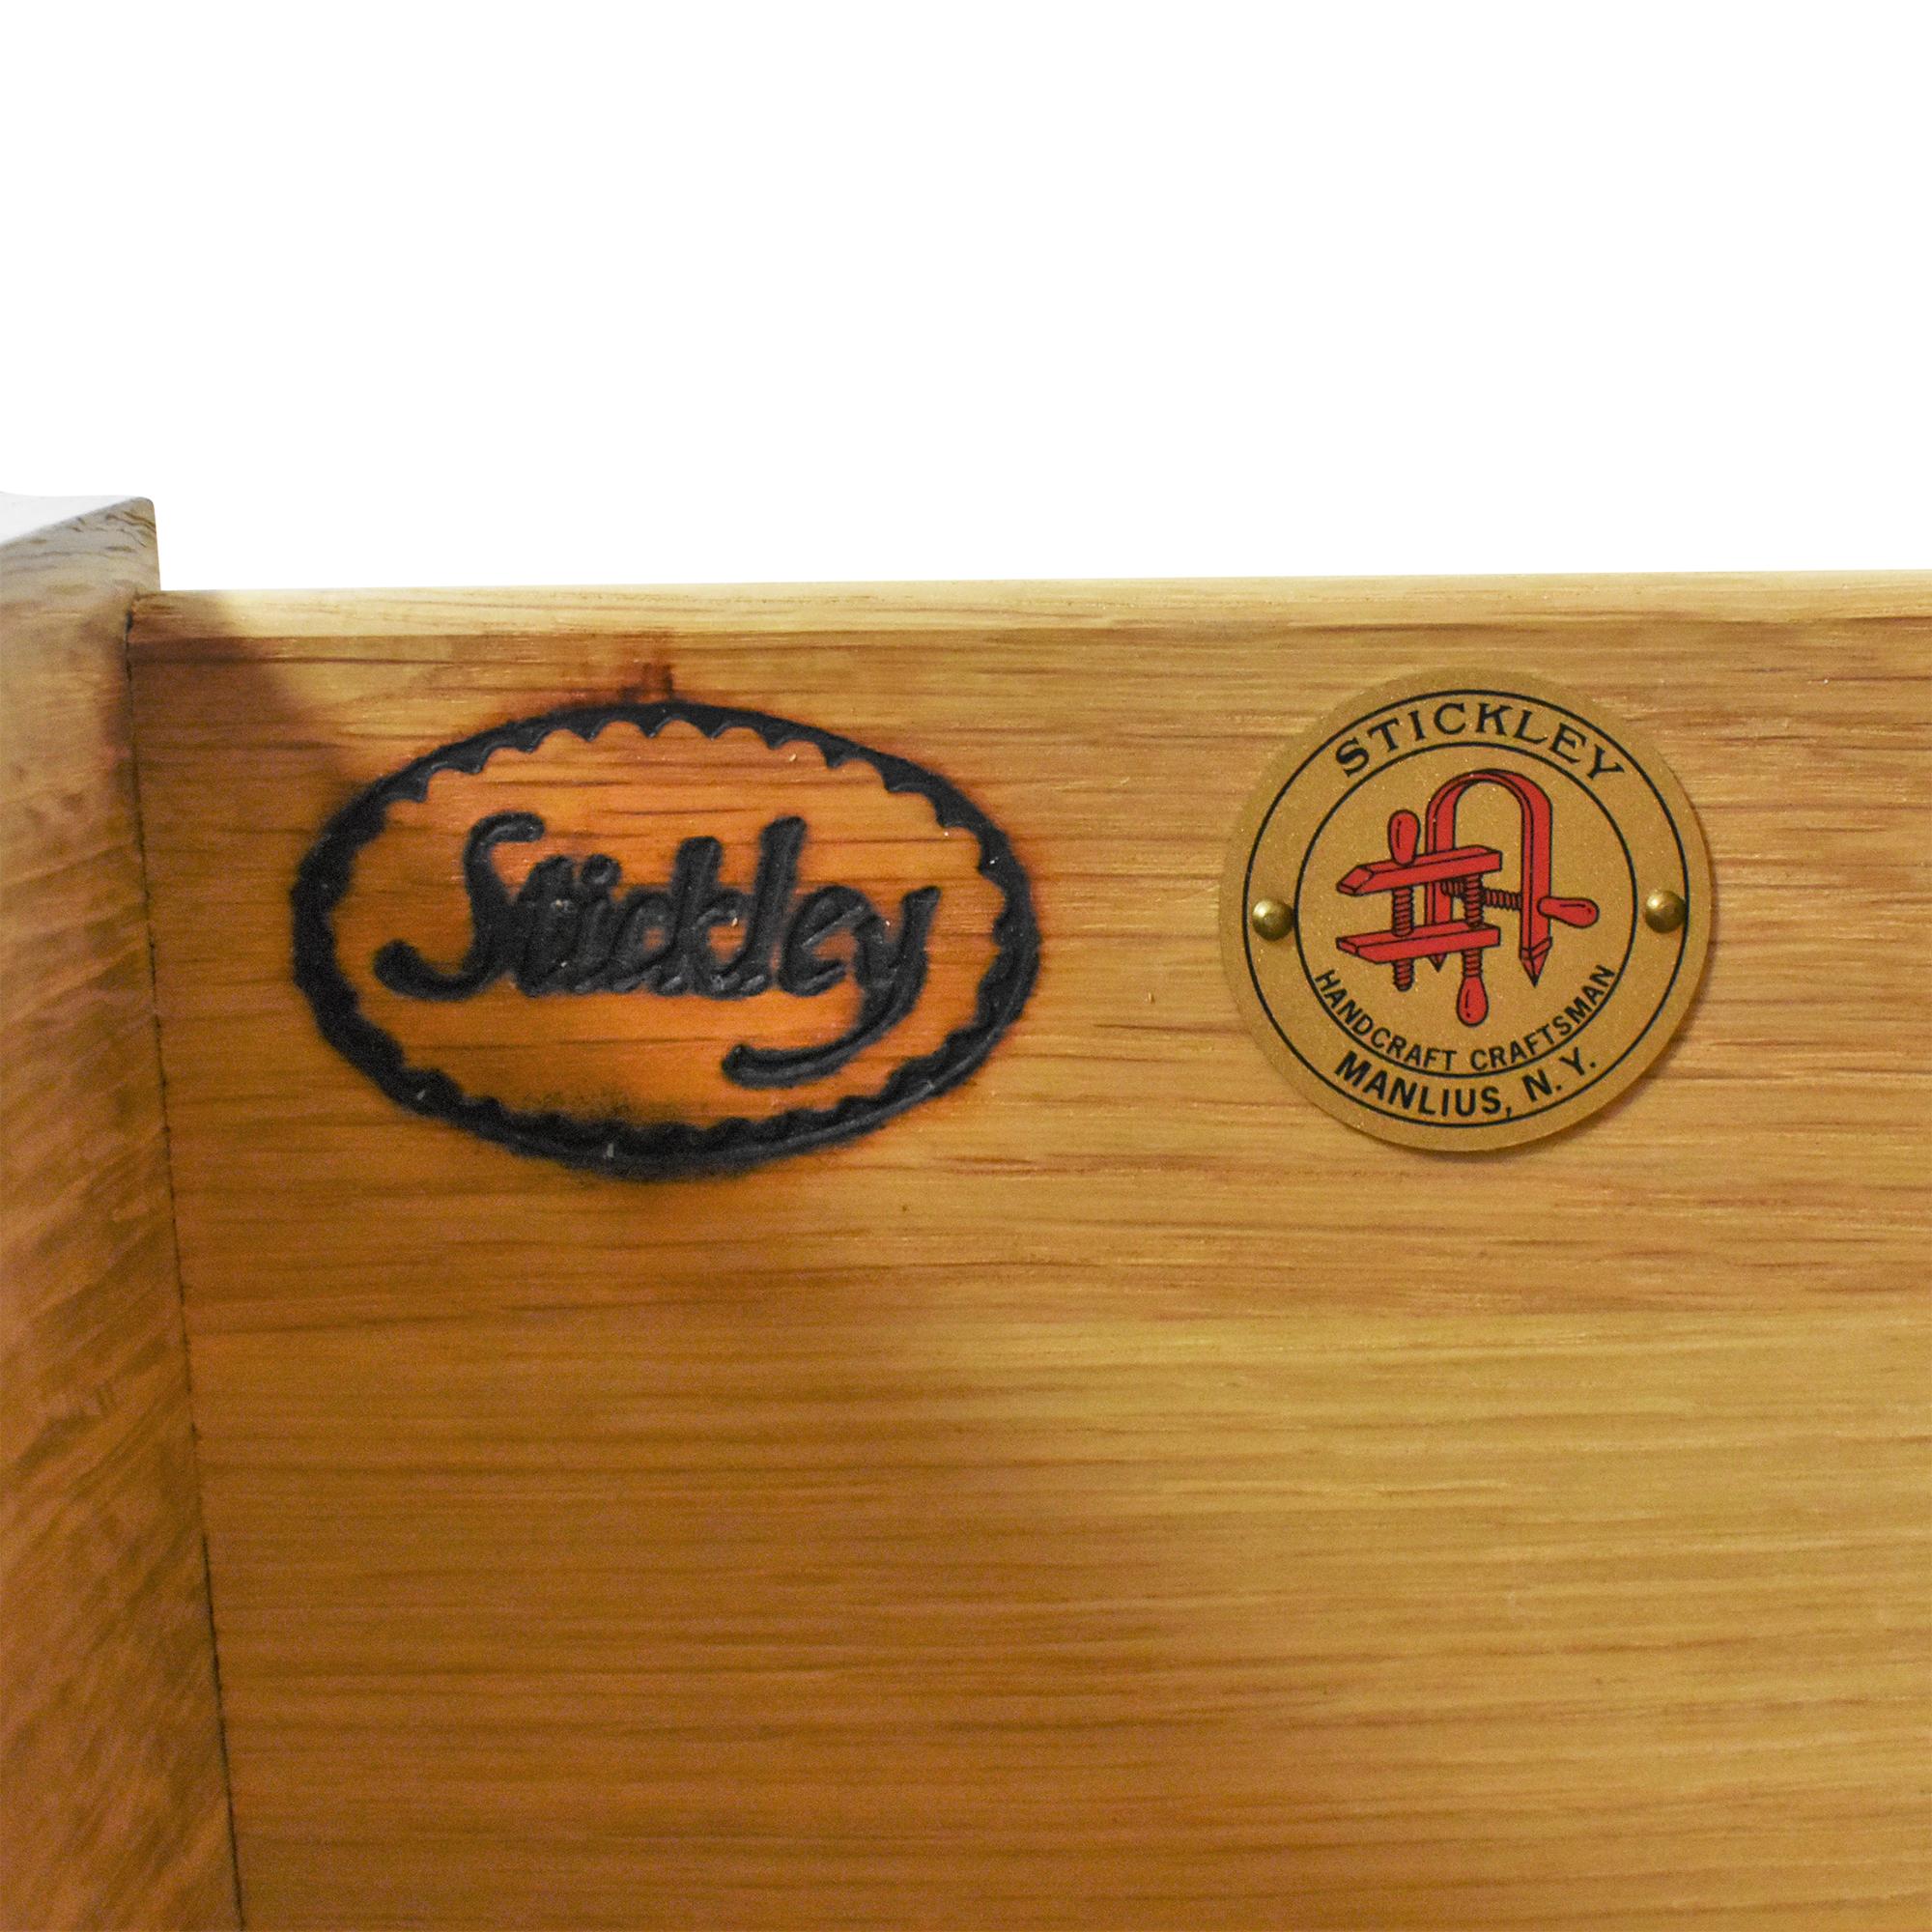 Stickley Furniture Stickley Furniture Media Cabinet used